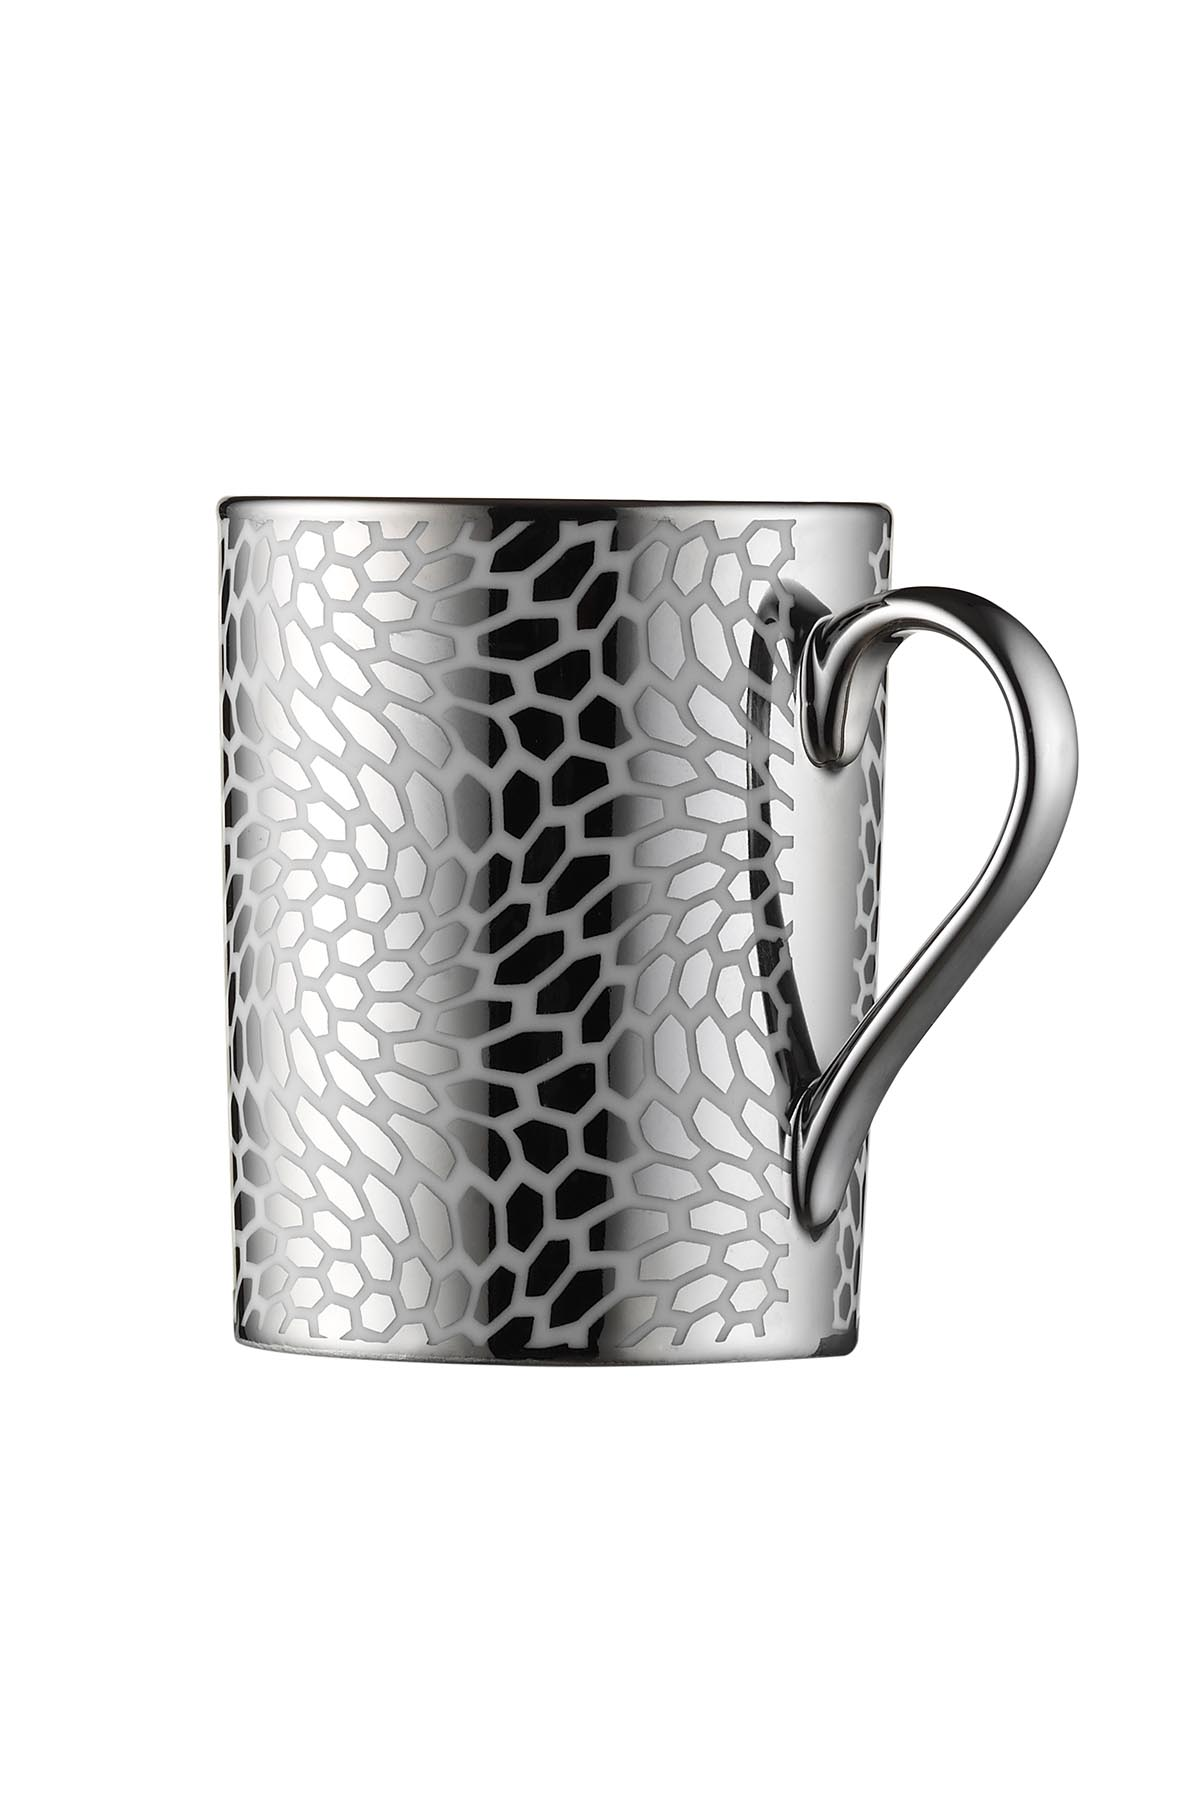 Kütahya Porselen Forest 2 prime;li Mug Bardak Platin 10927